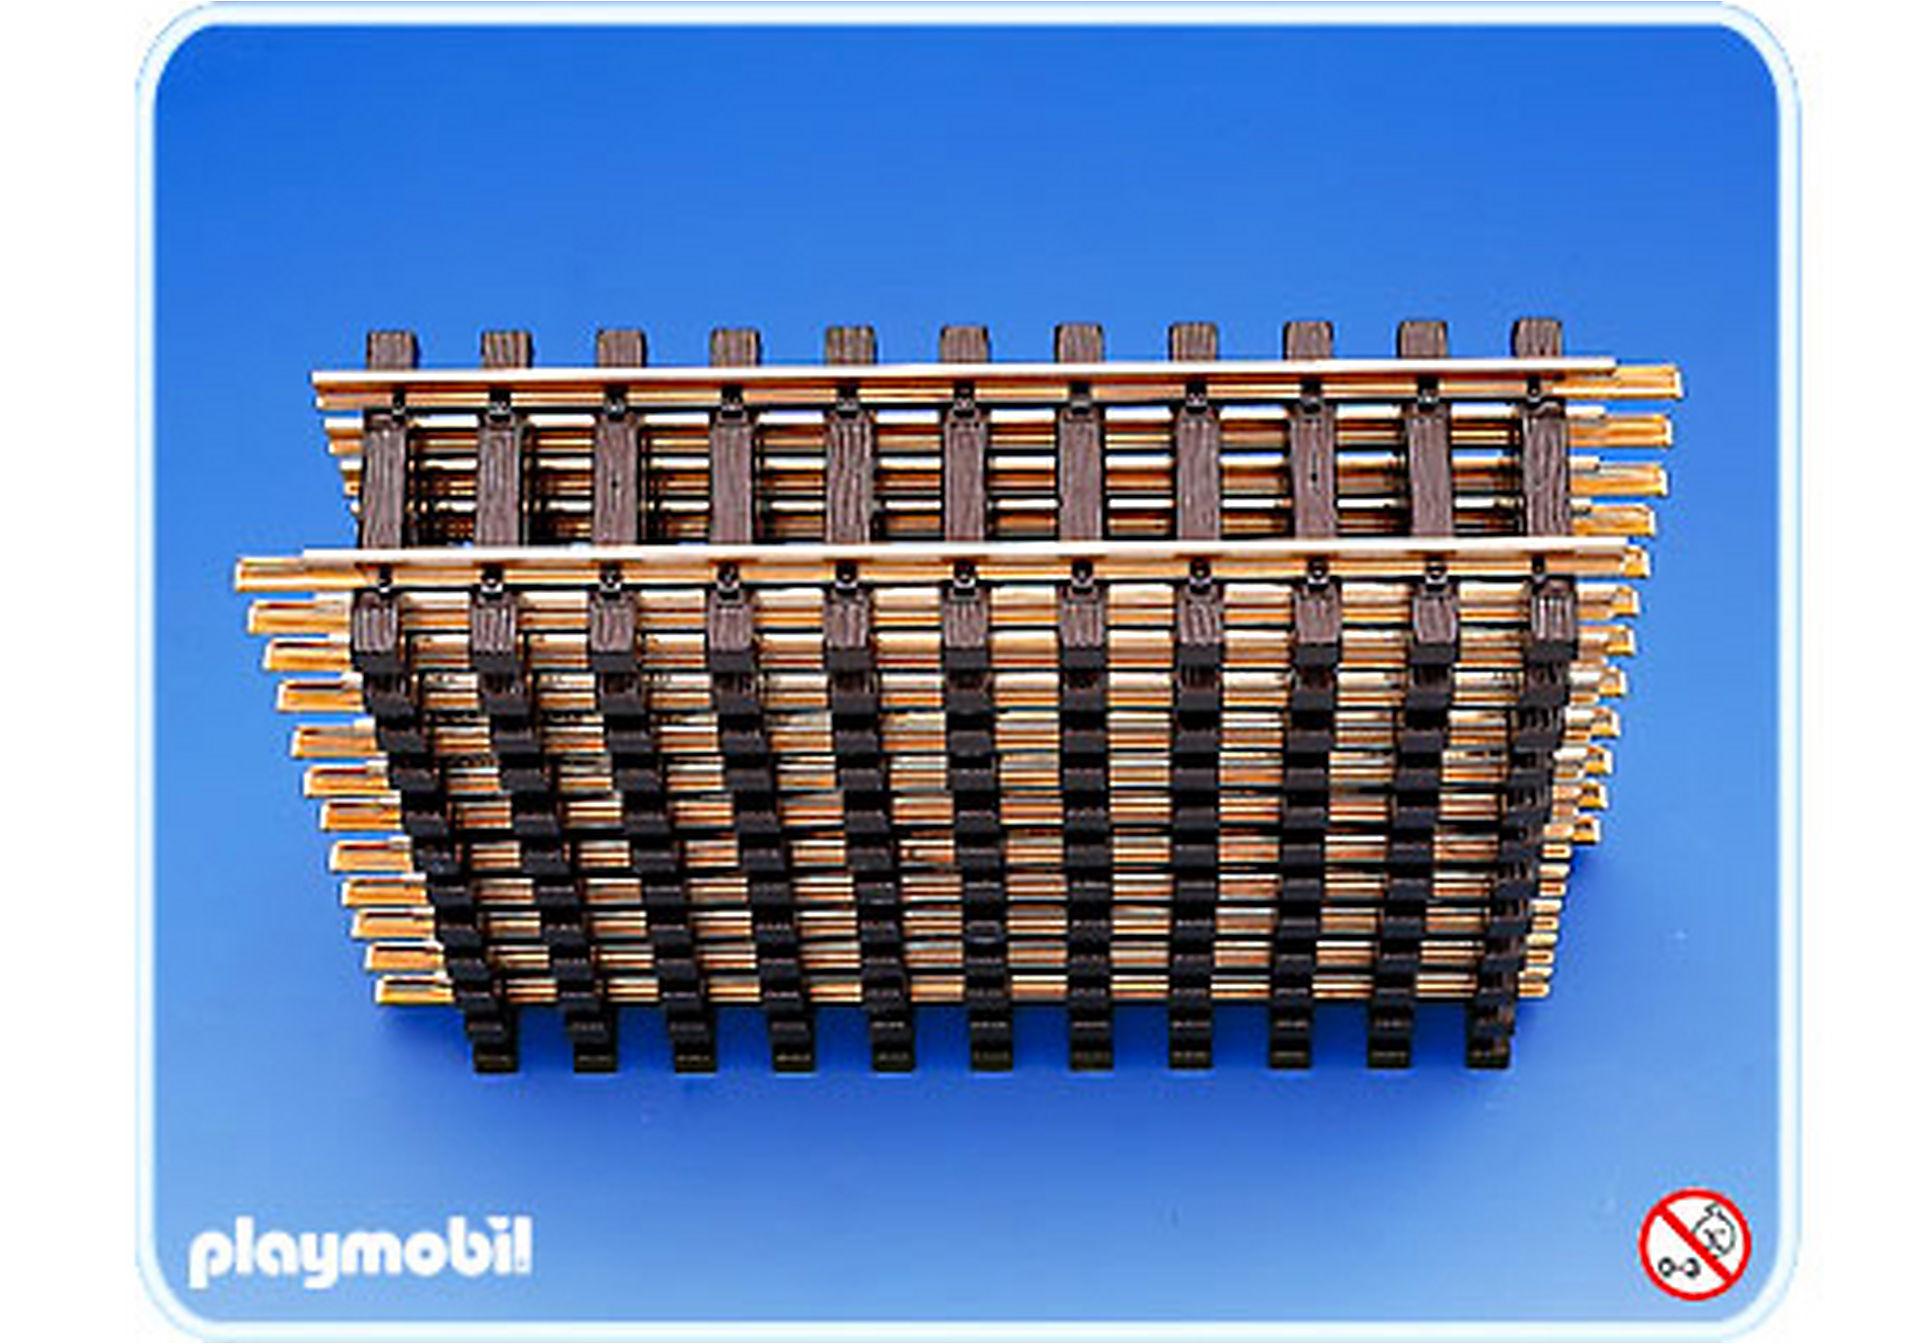 http://media.playmobil.com/i/playmobil/4355-A_product_detail/12 rails droits